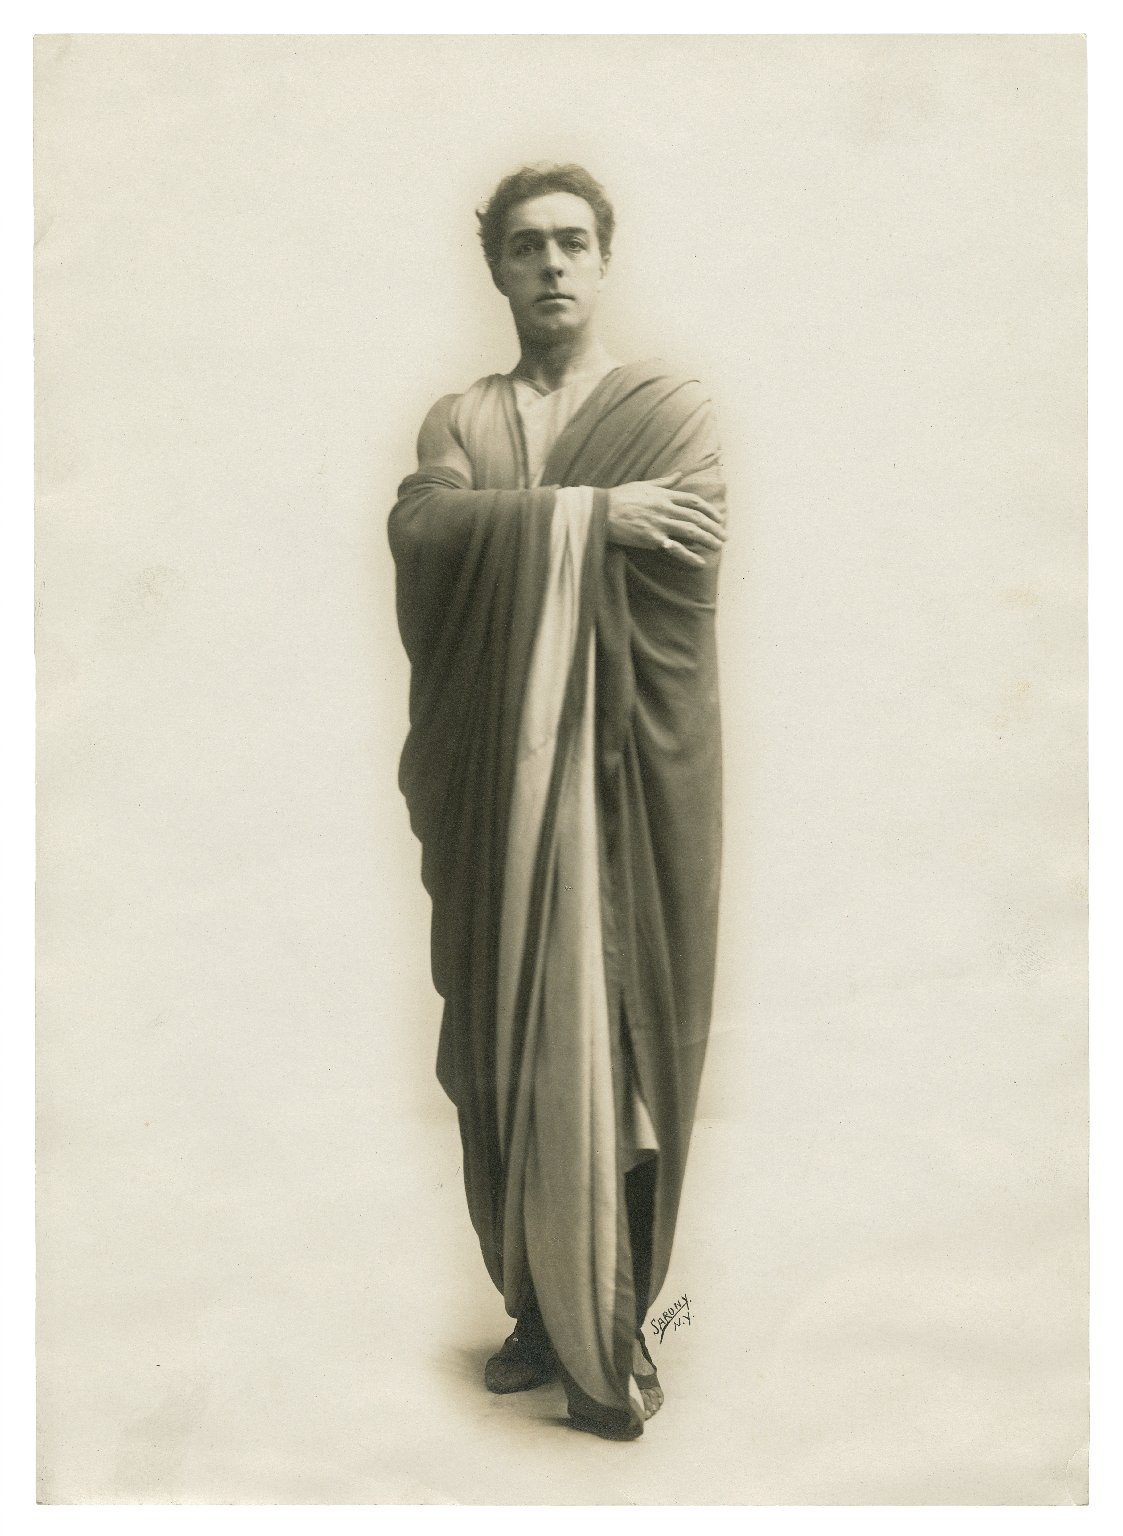 Faversham as Mark [Antony in Shakespeare's Julius Caesar] [graphic] / Sarony.